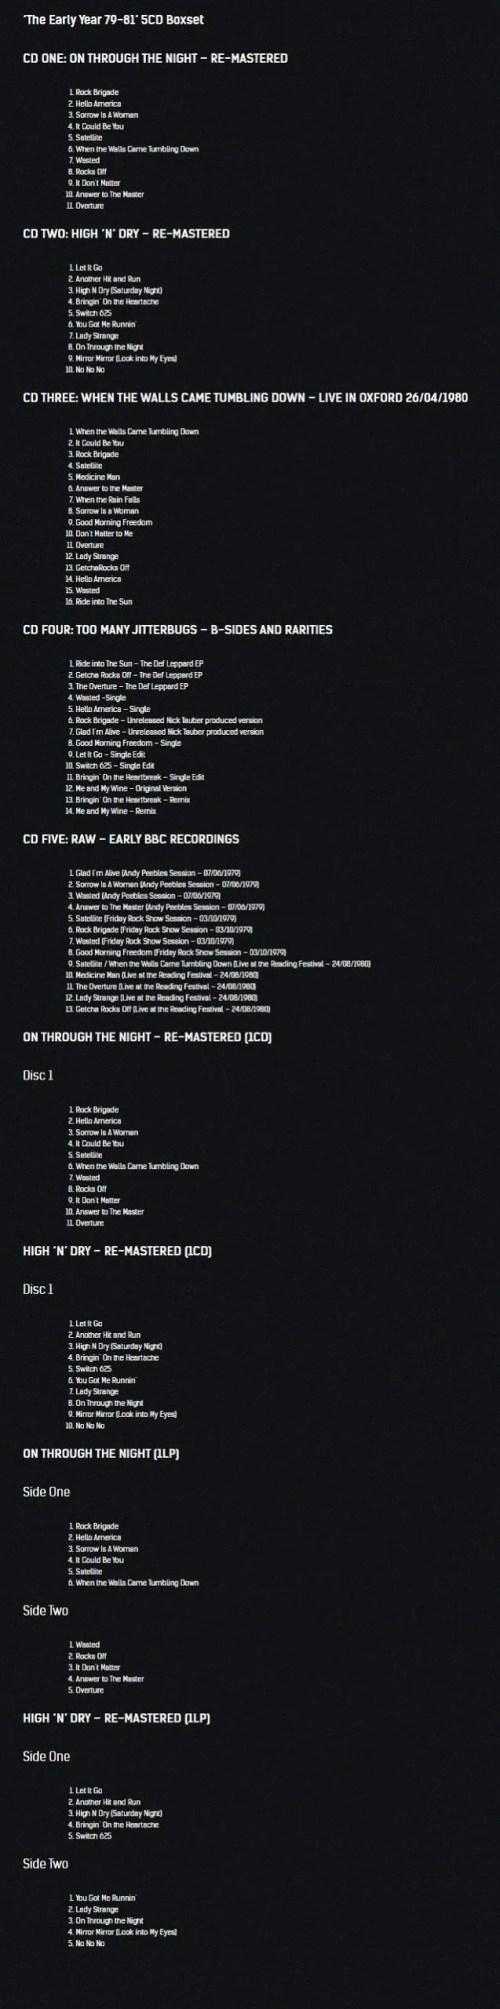 Def Leppard Early Years box set tracklisting